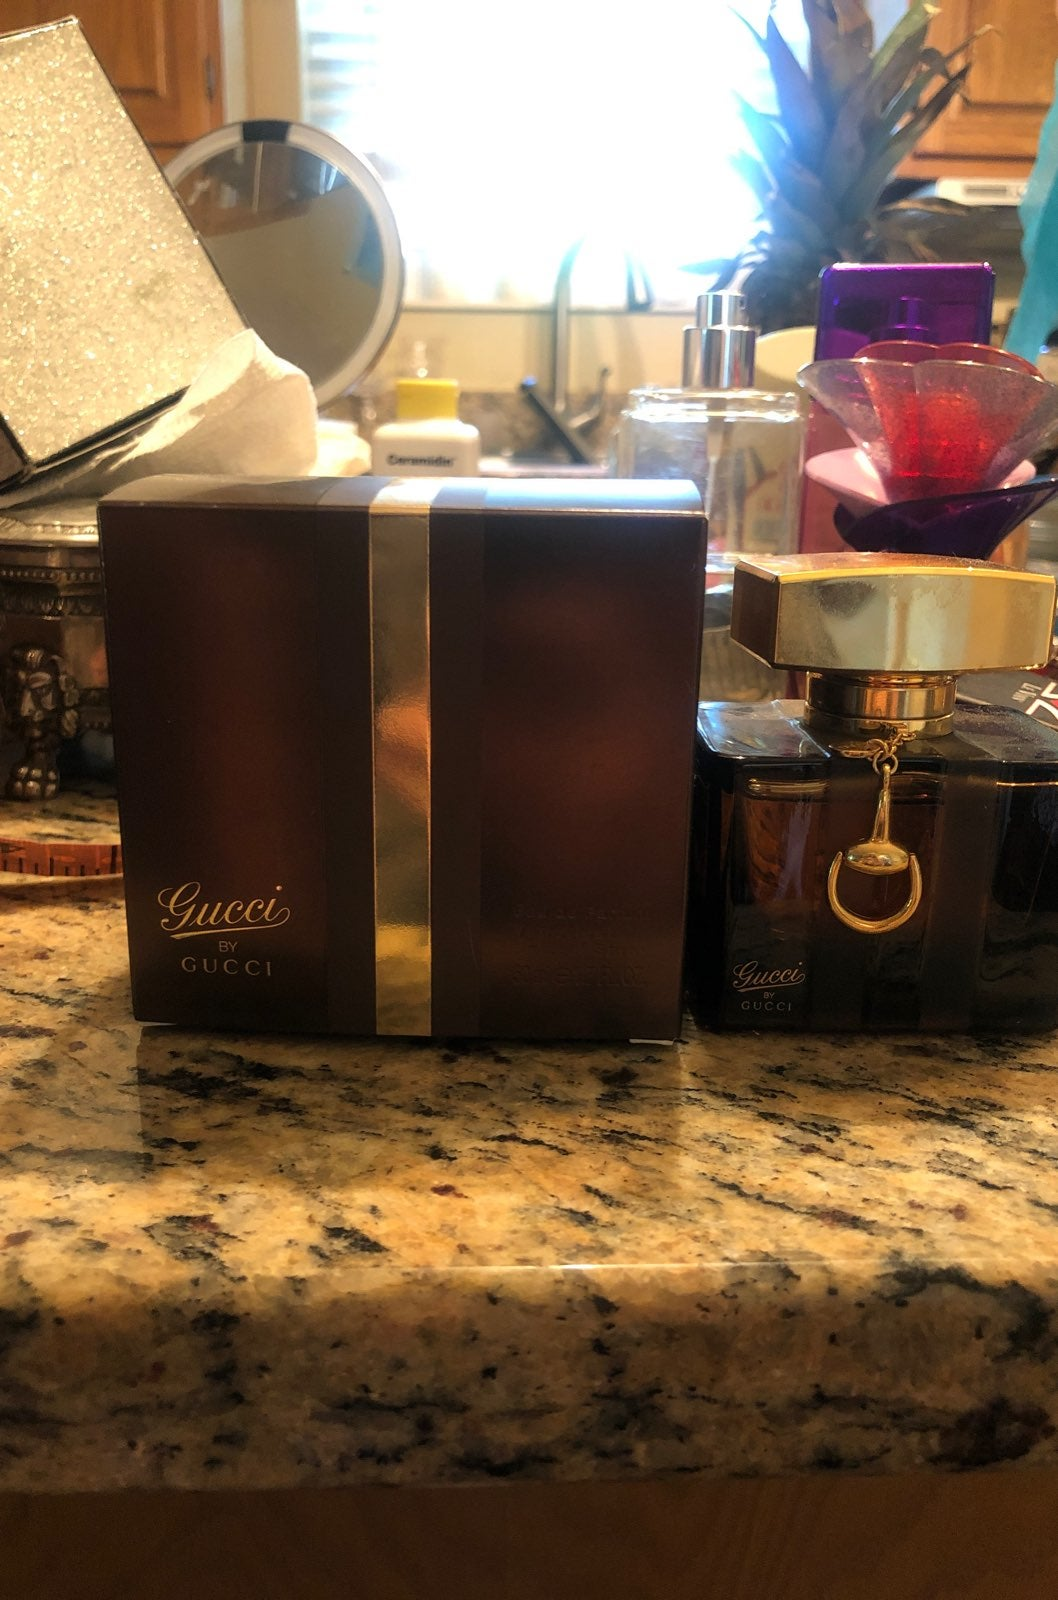 Gucci by gucci EDP 50 ml parfum natural